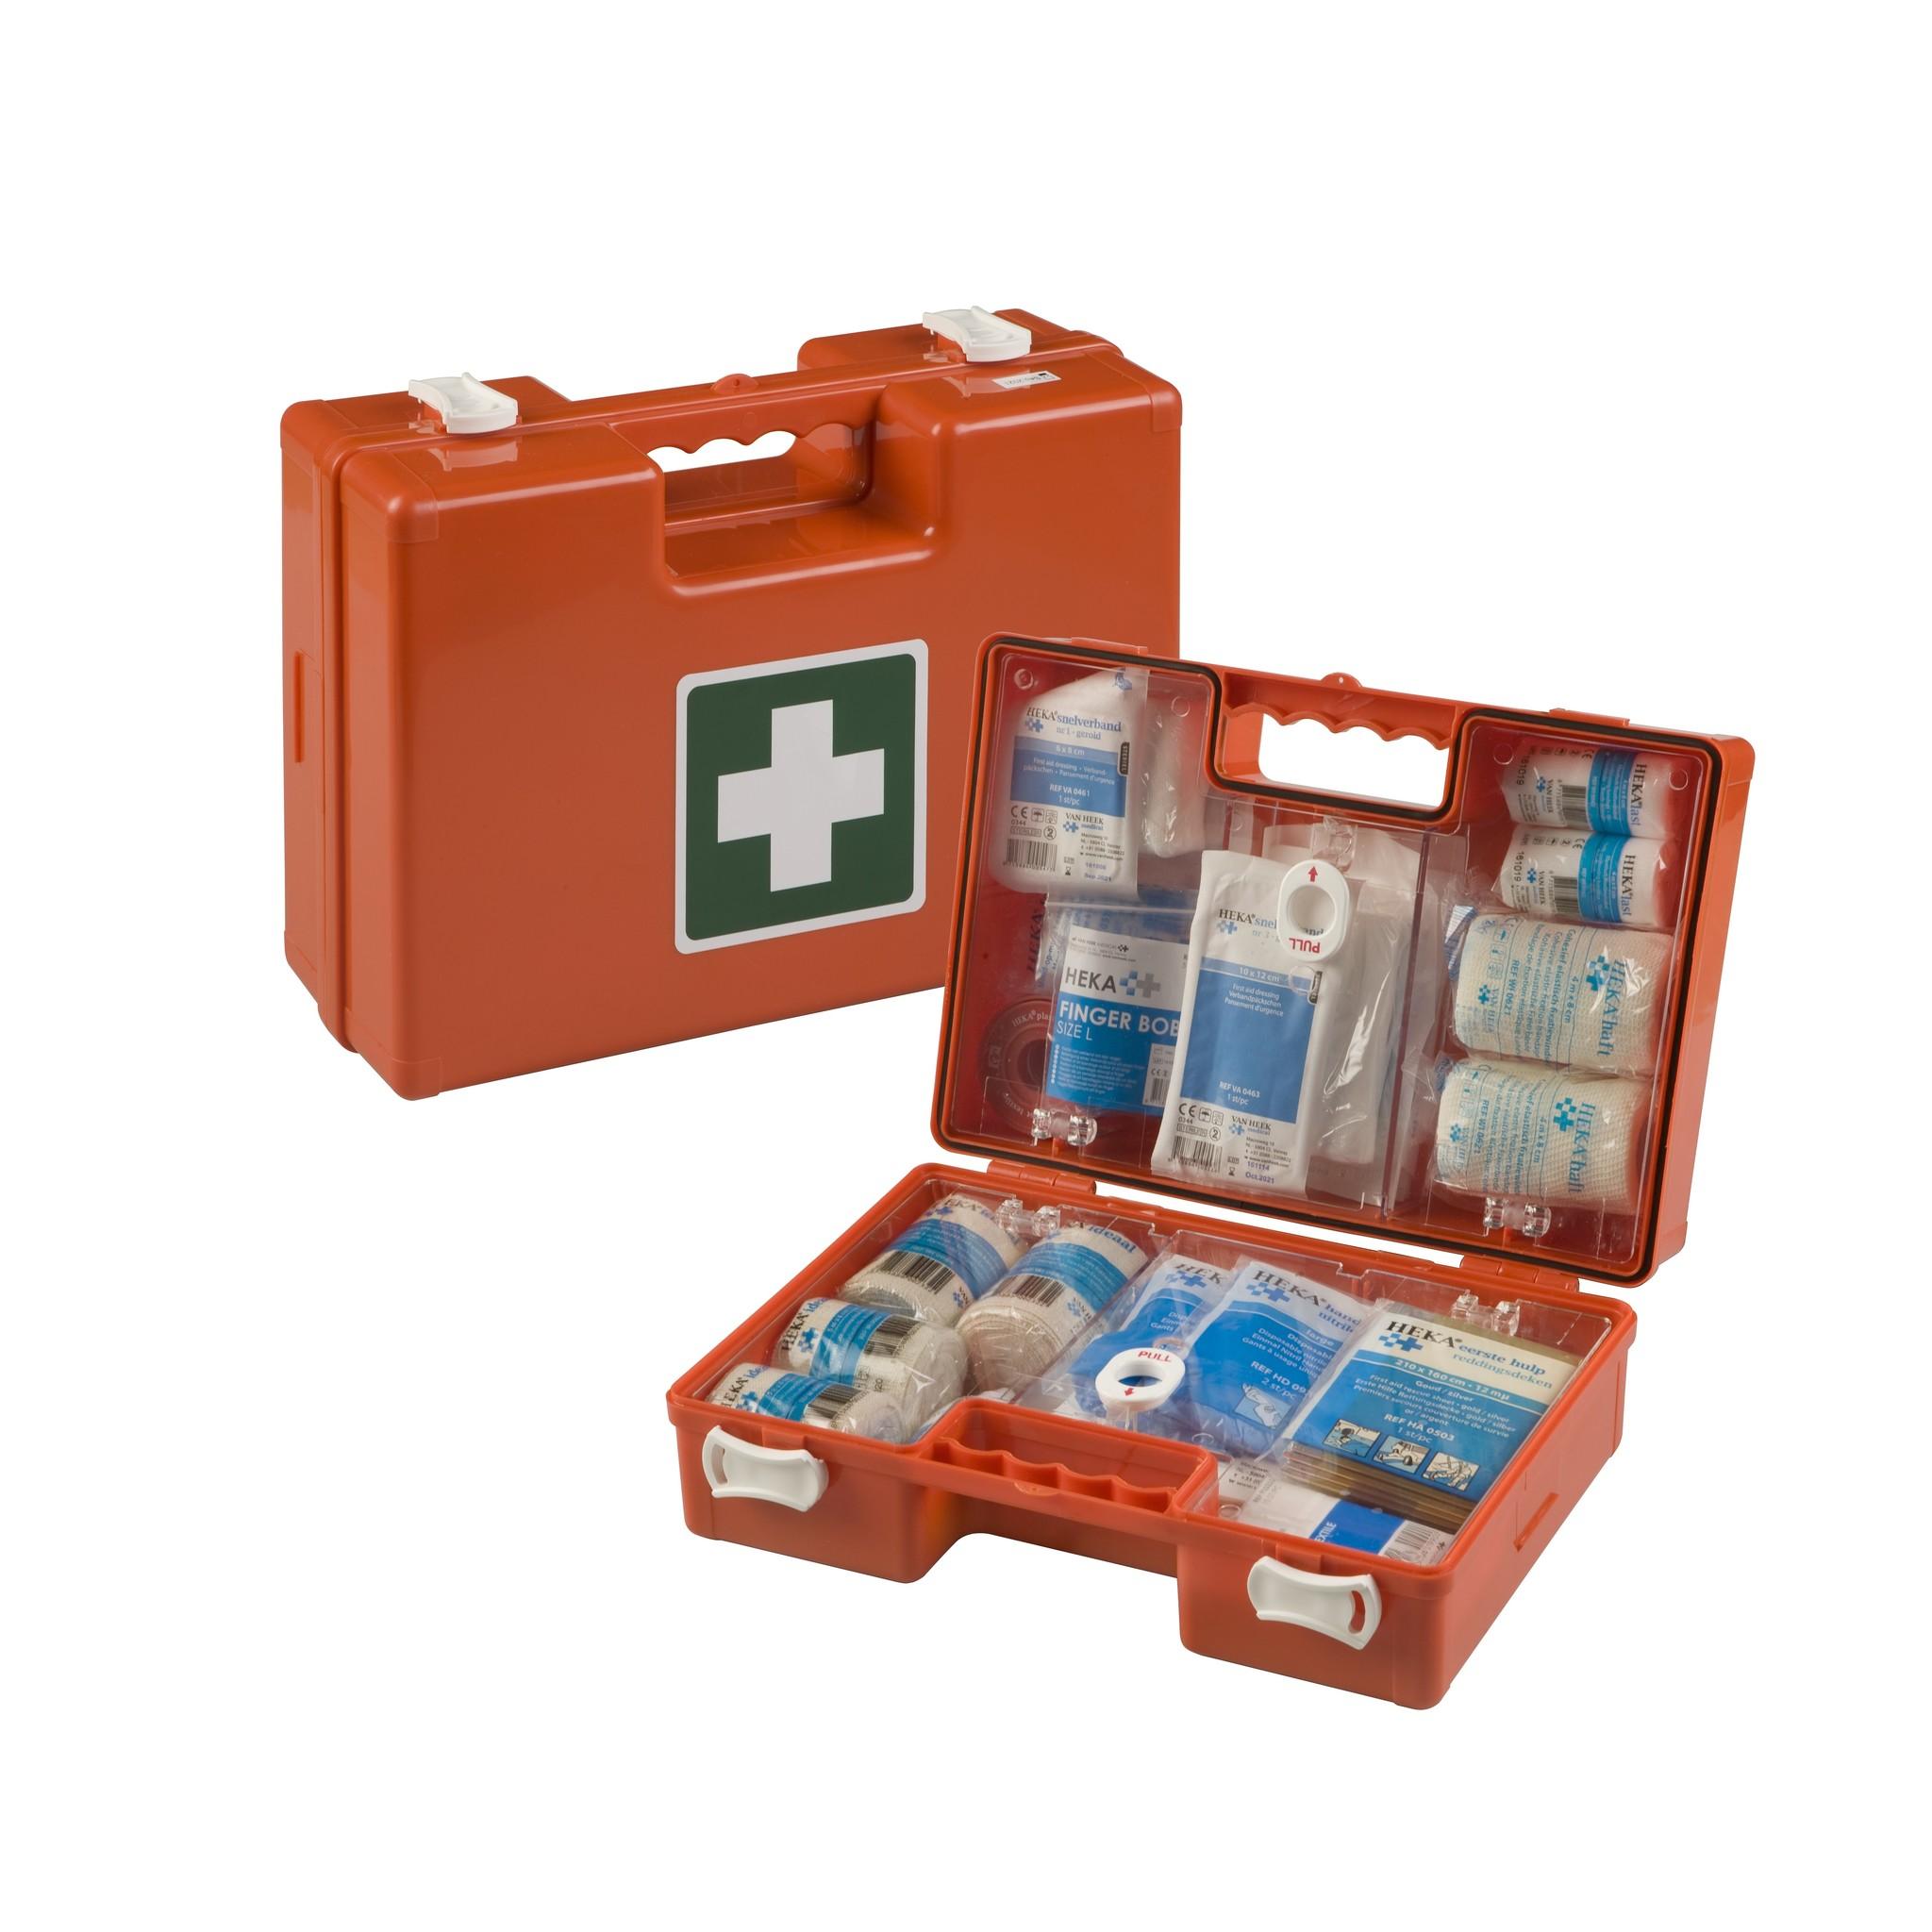 HEKA Erste Hilfe Notfallkoffer Medimulti BHV 2016